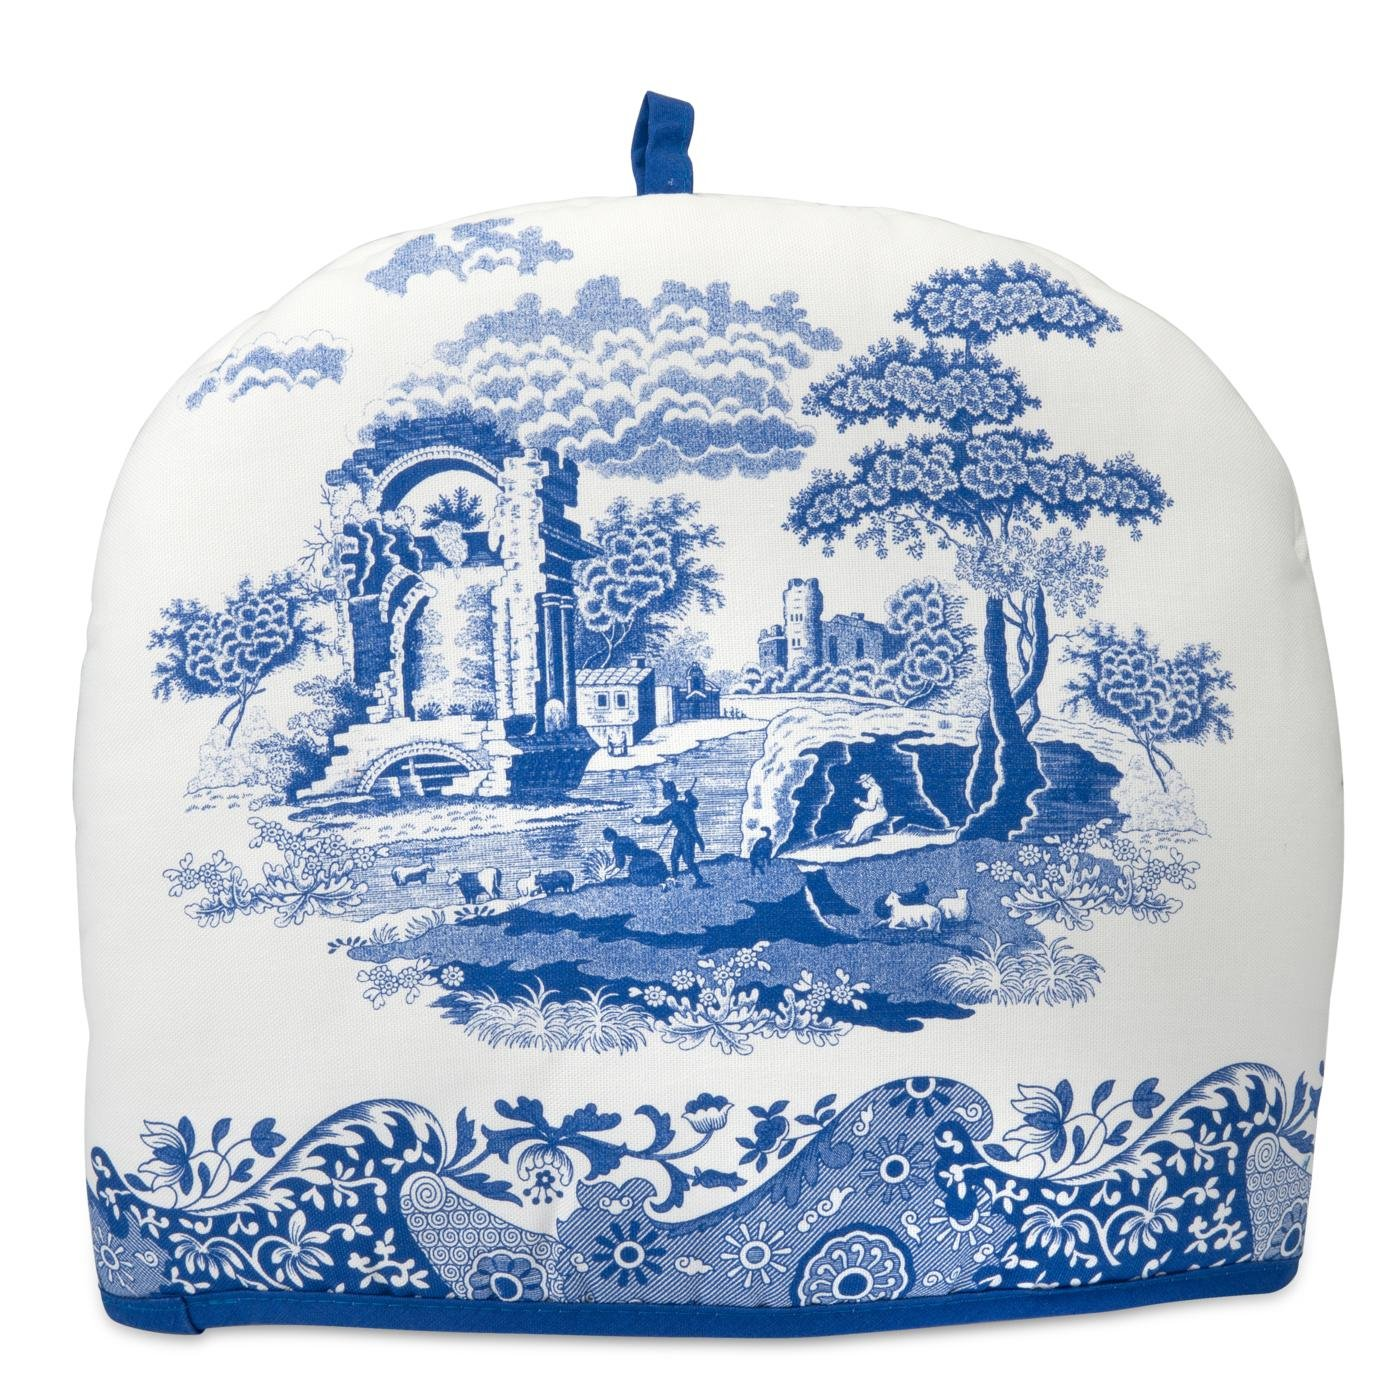 Spode Blue Italian Tea Cosy by Spode